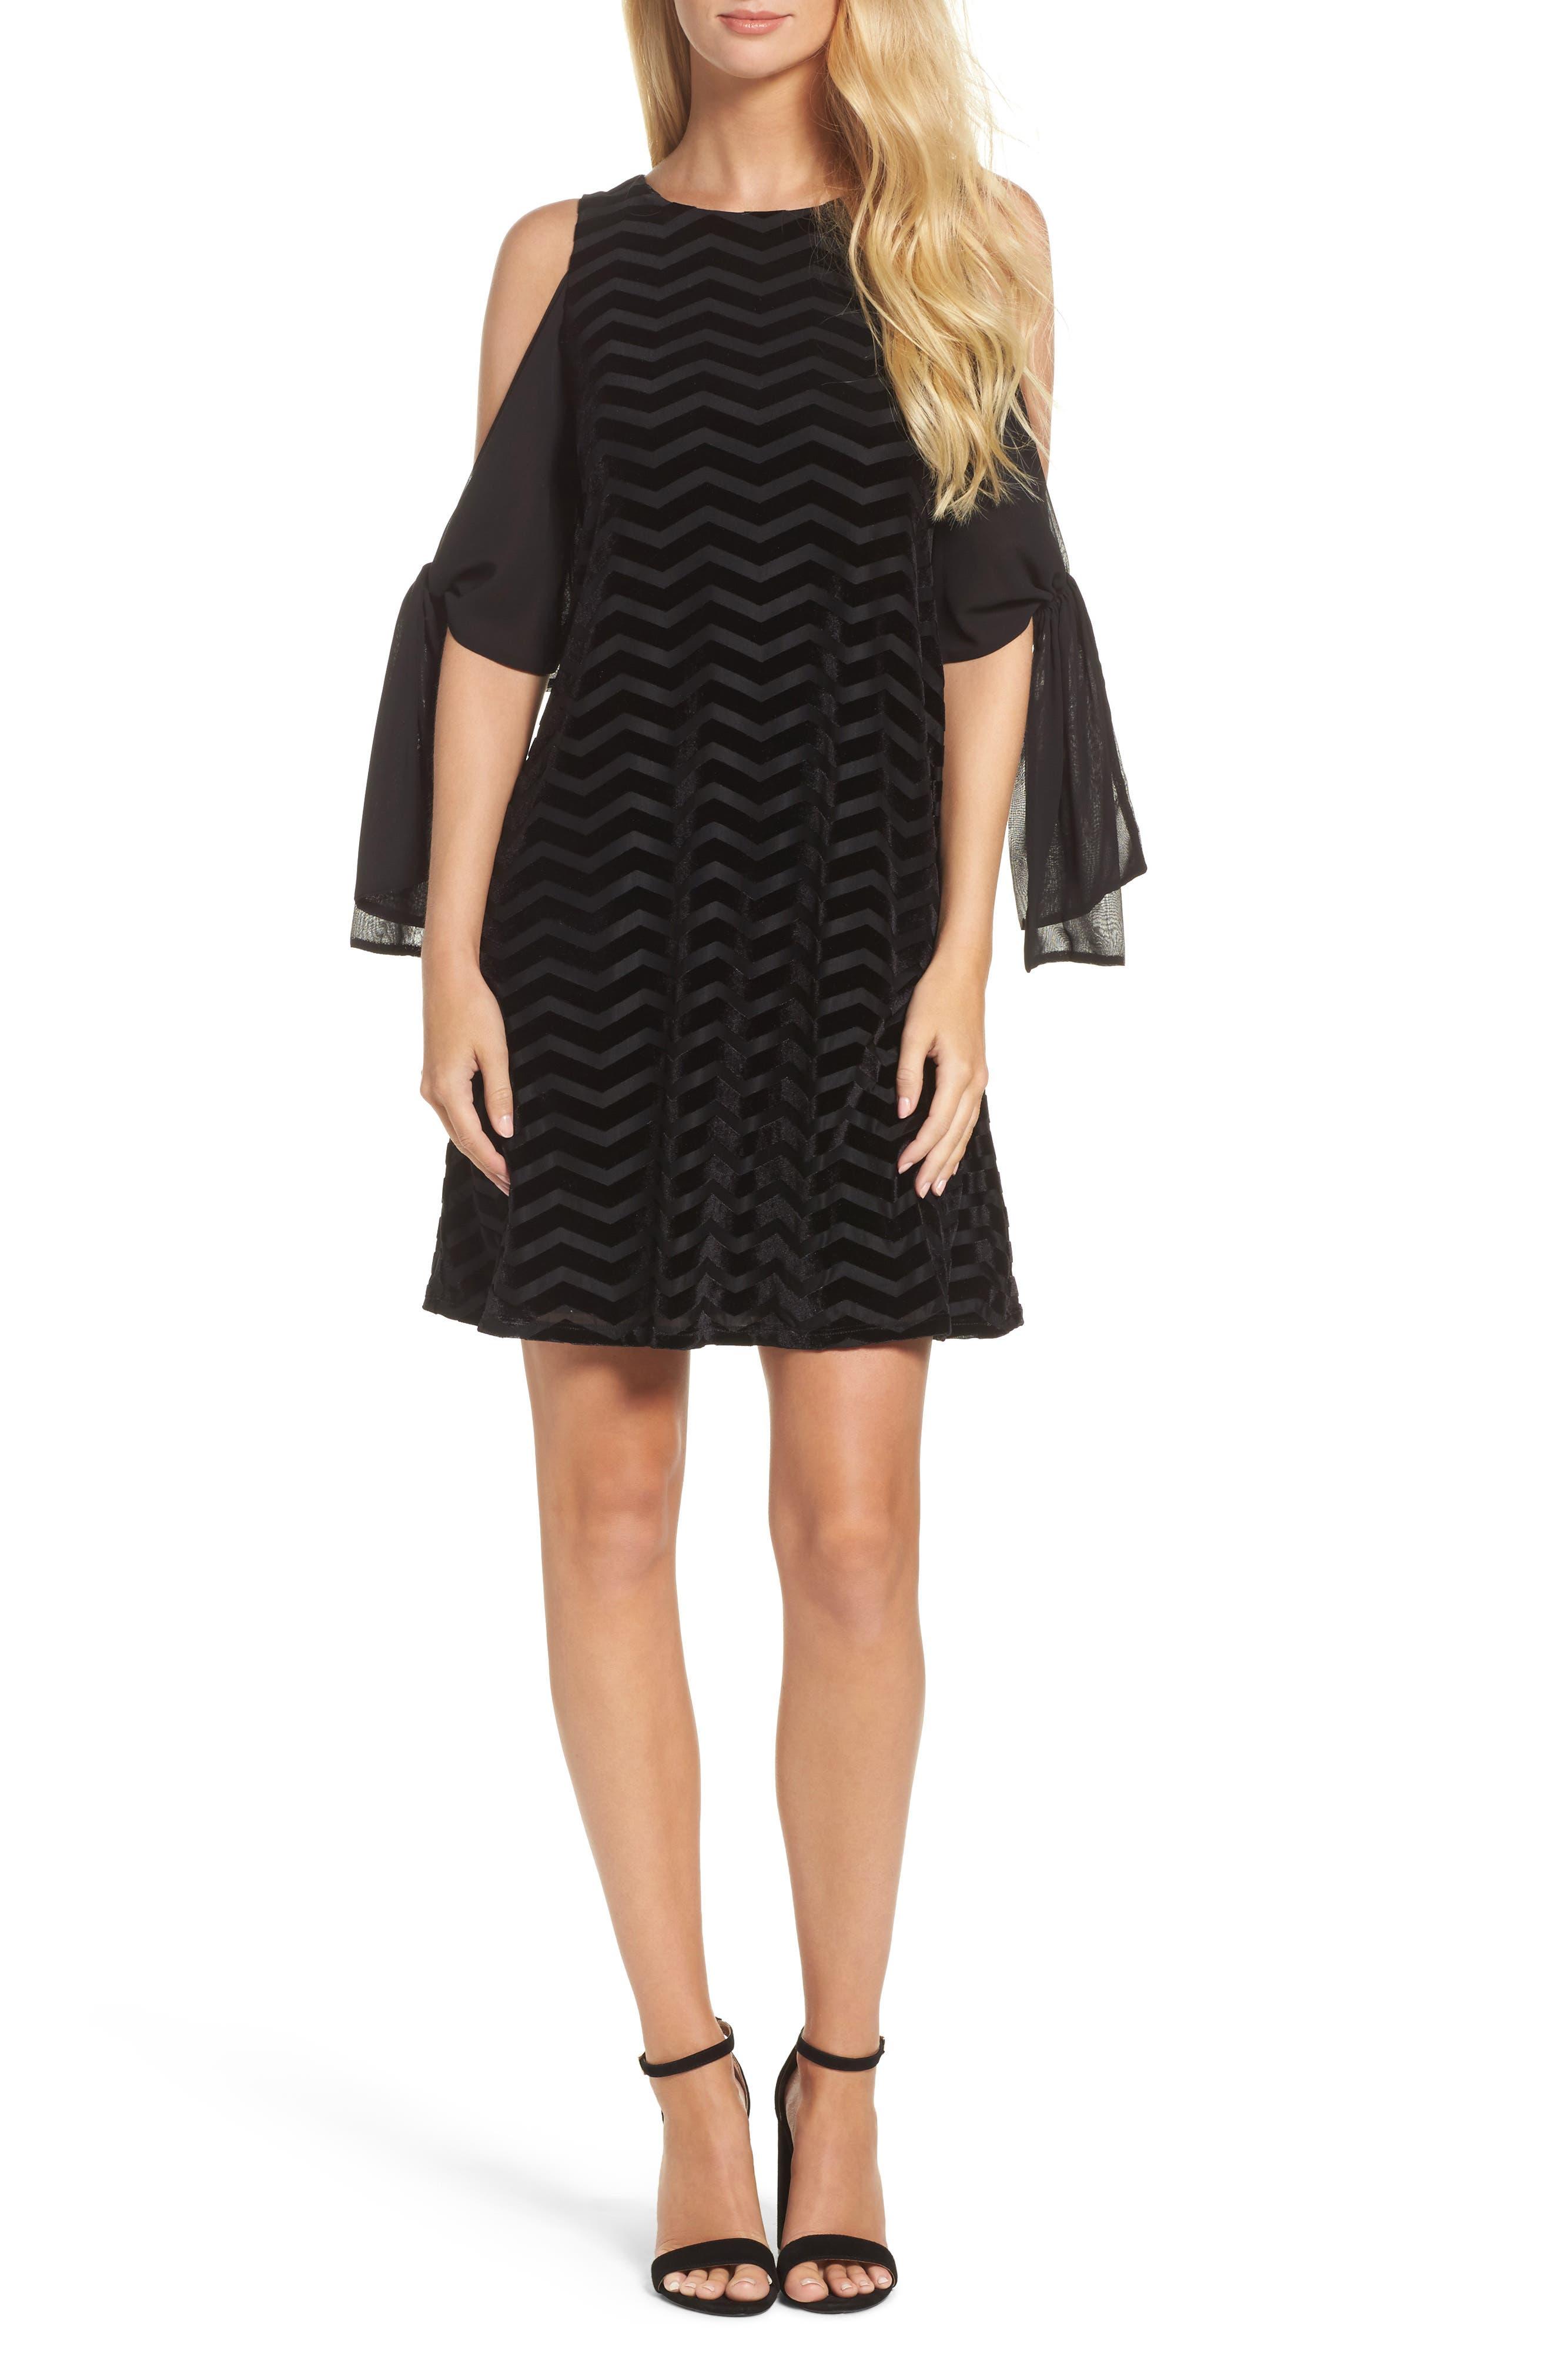 Taylor Dresses Chiffon Sleeve Velvet Burnout Shift Dress